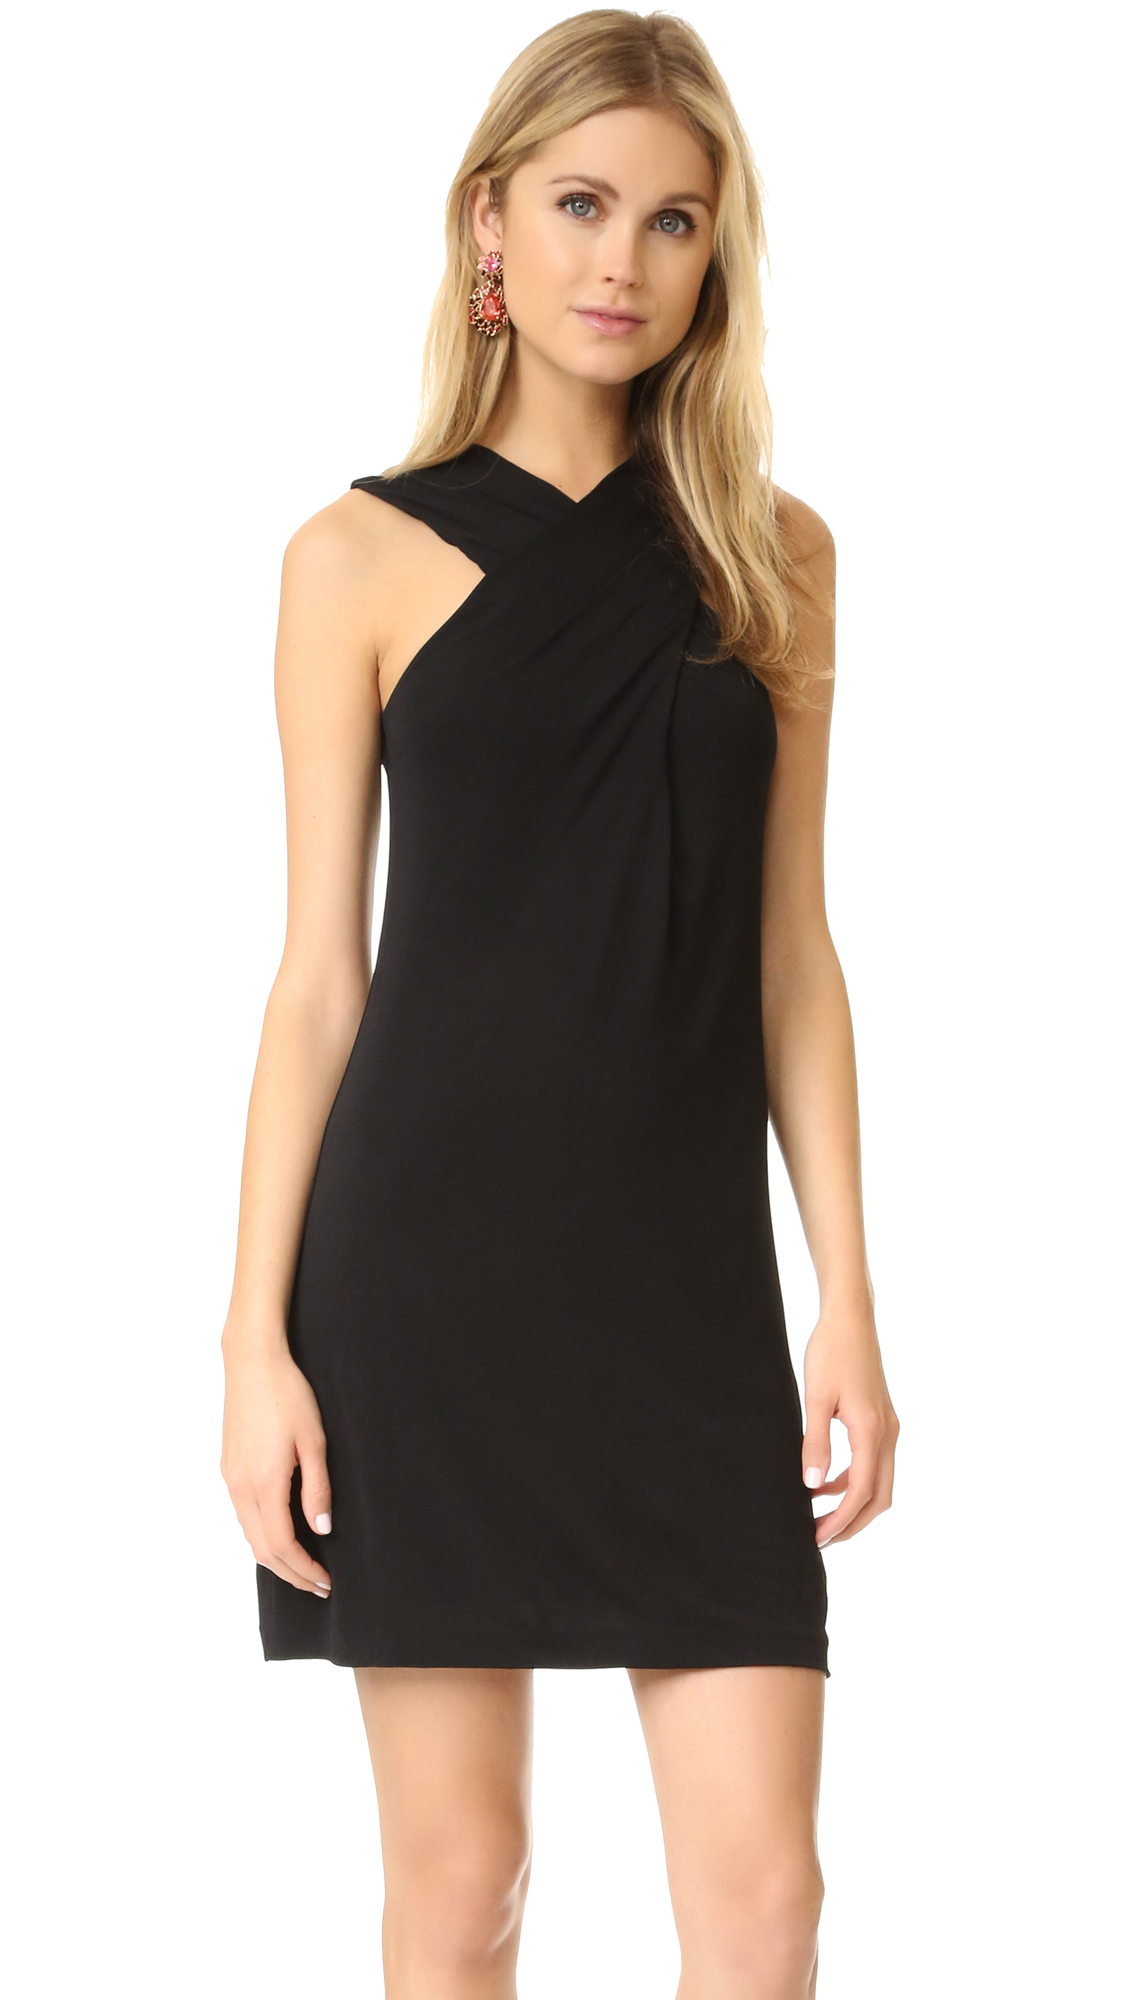 Rachel Zoe Crisscross Dress - Black